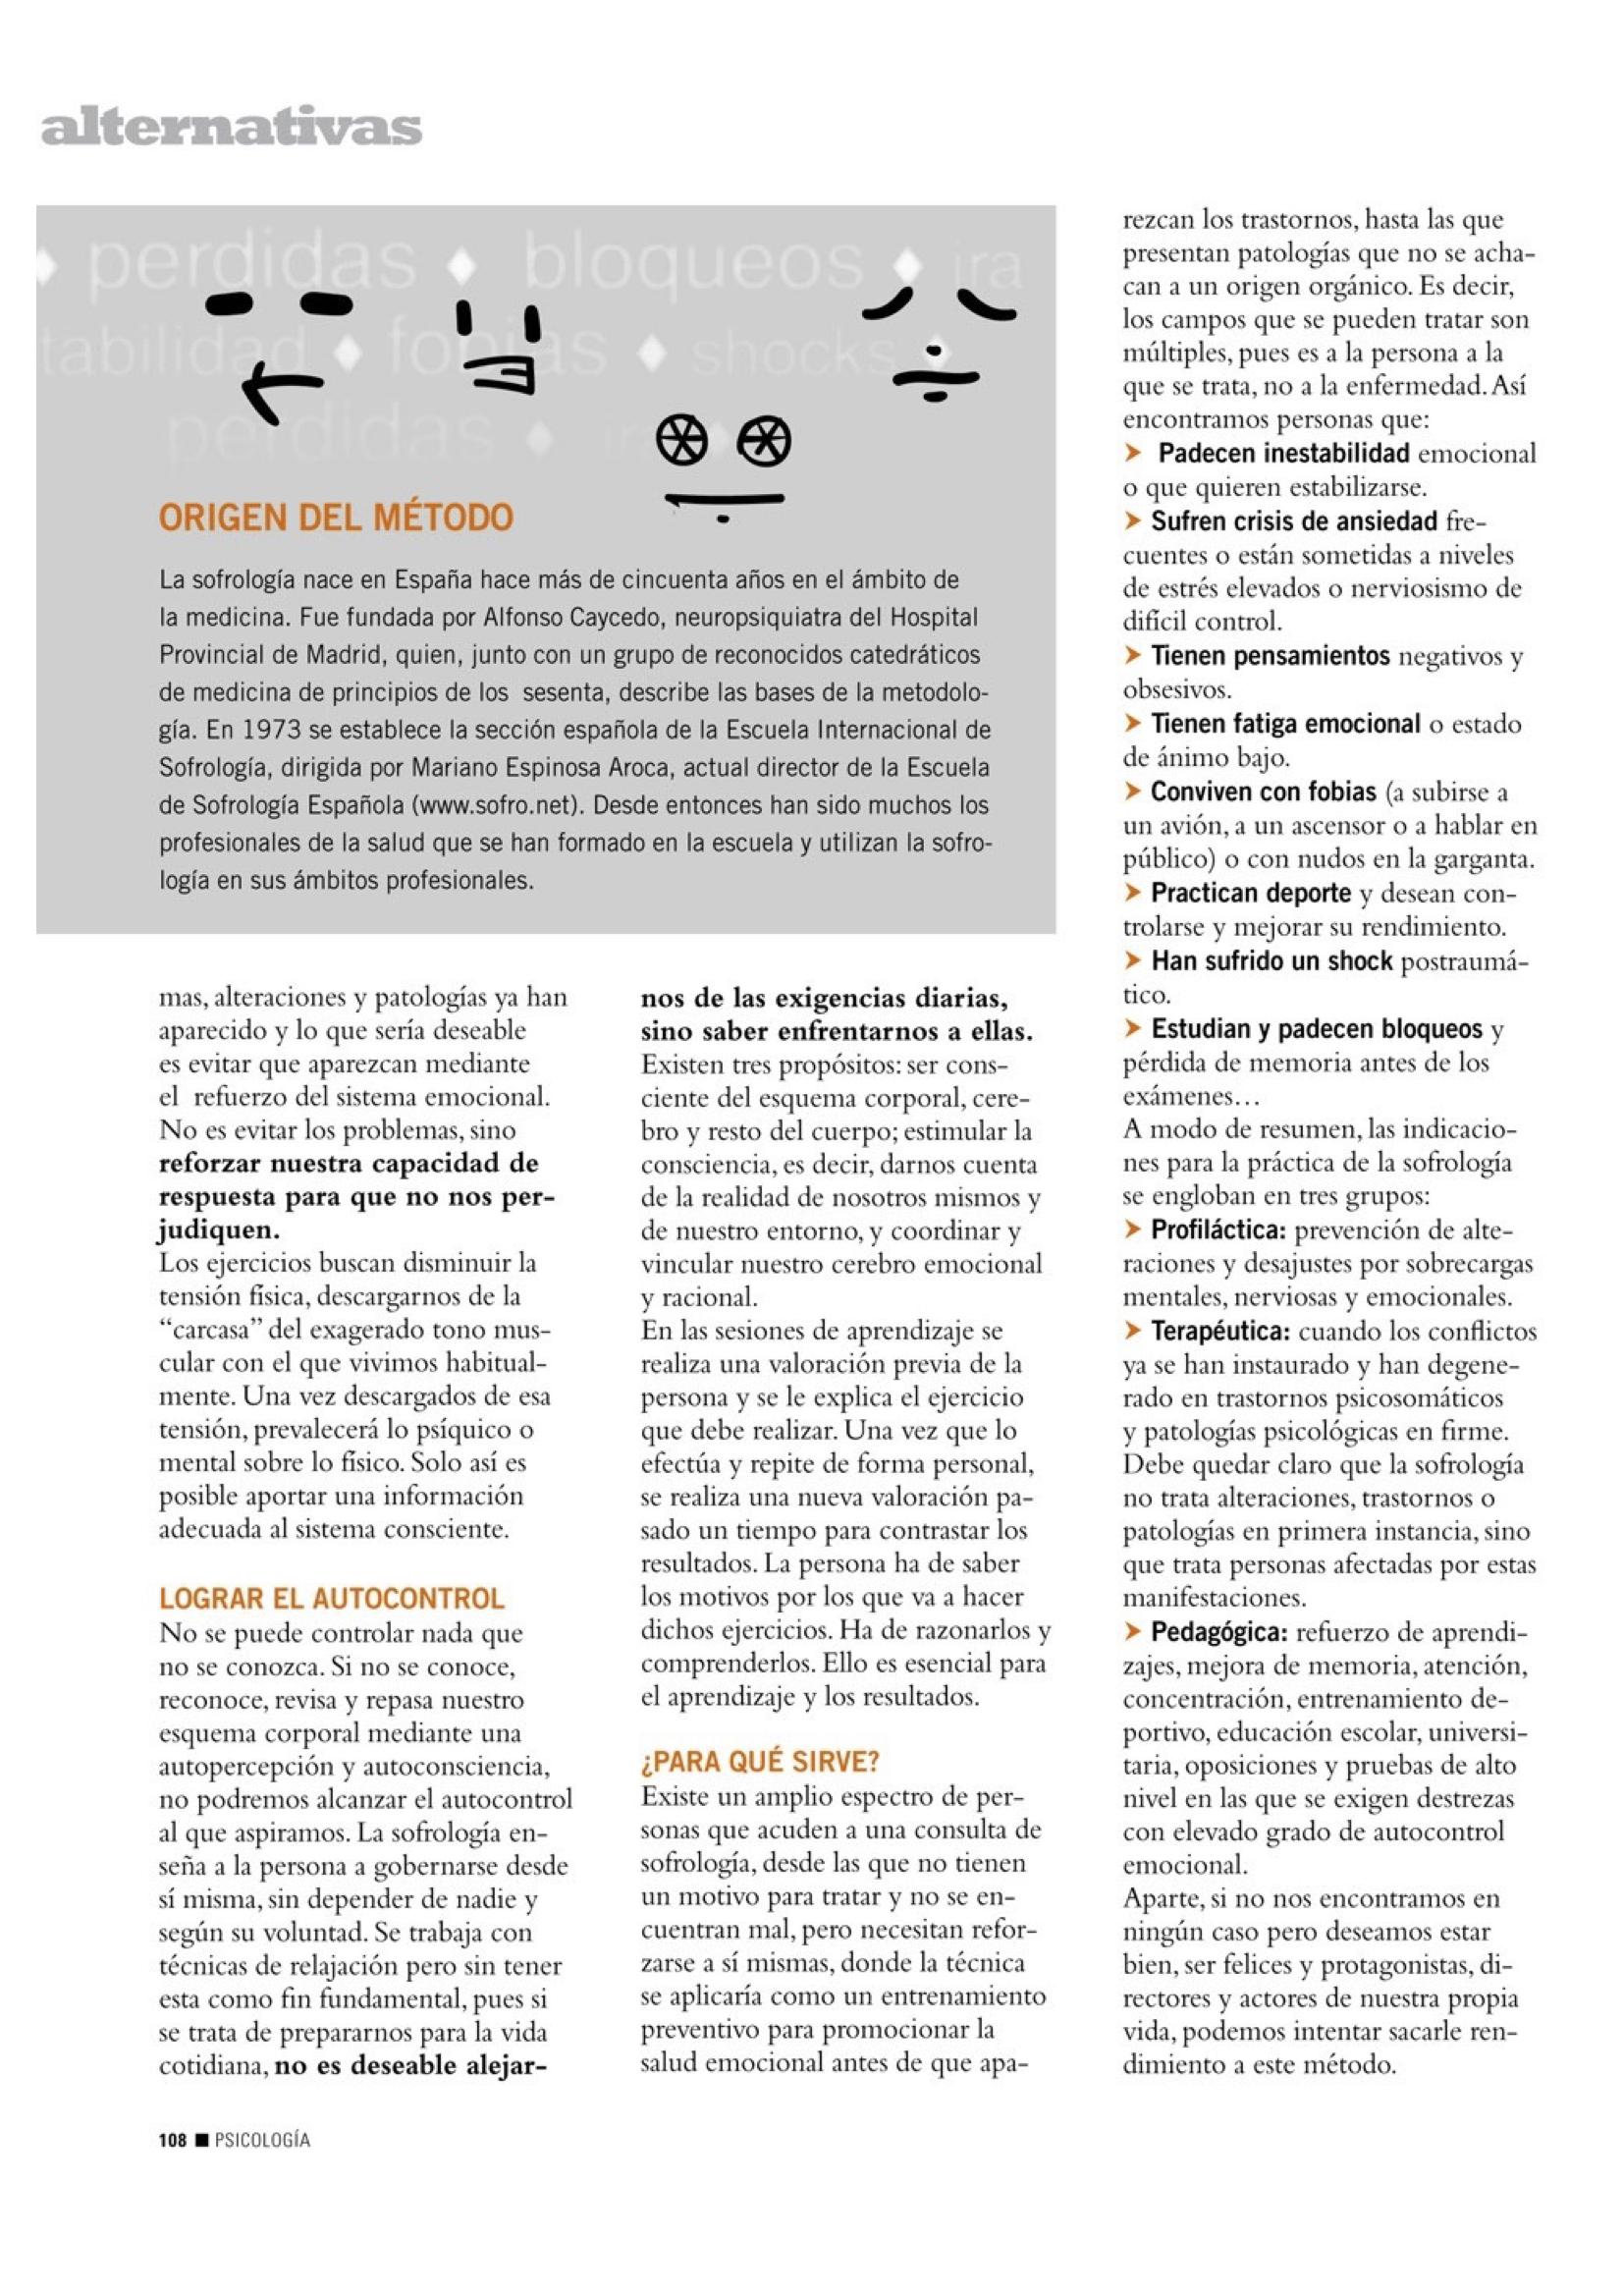 sofrologia medica